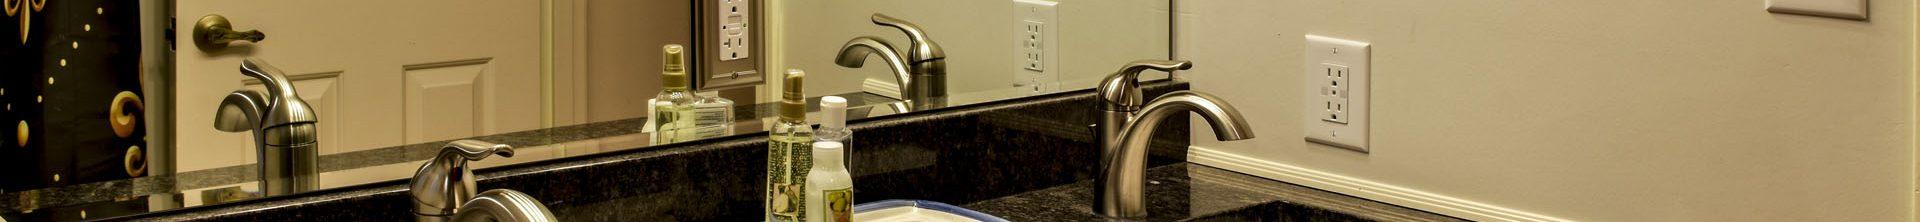 Louisville Kentucky Bath Renovation, Granite Vanity Top, Fleur de Lis Hardware, Fleur de Lis Shower Curtain, Brushed Nickel Faucets